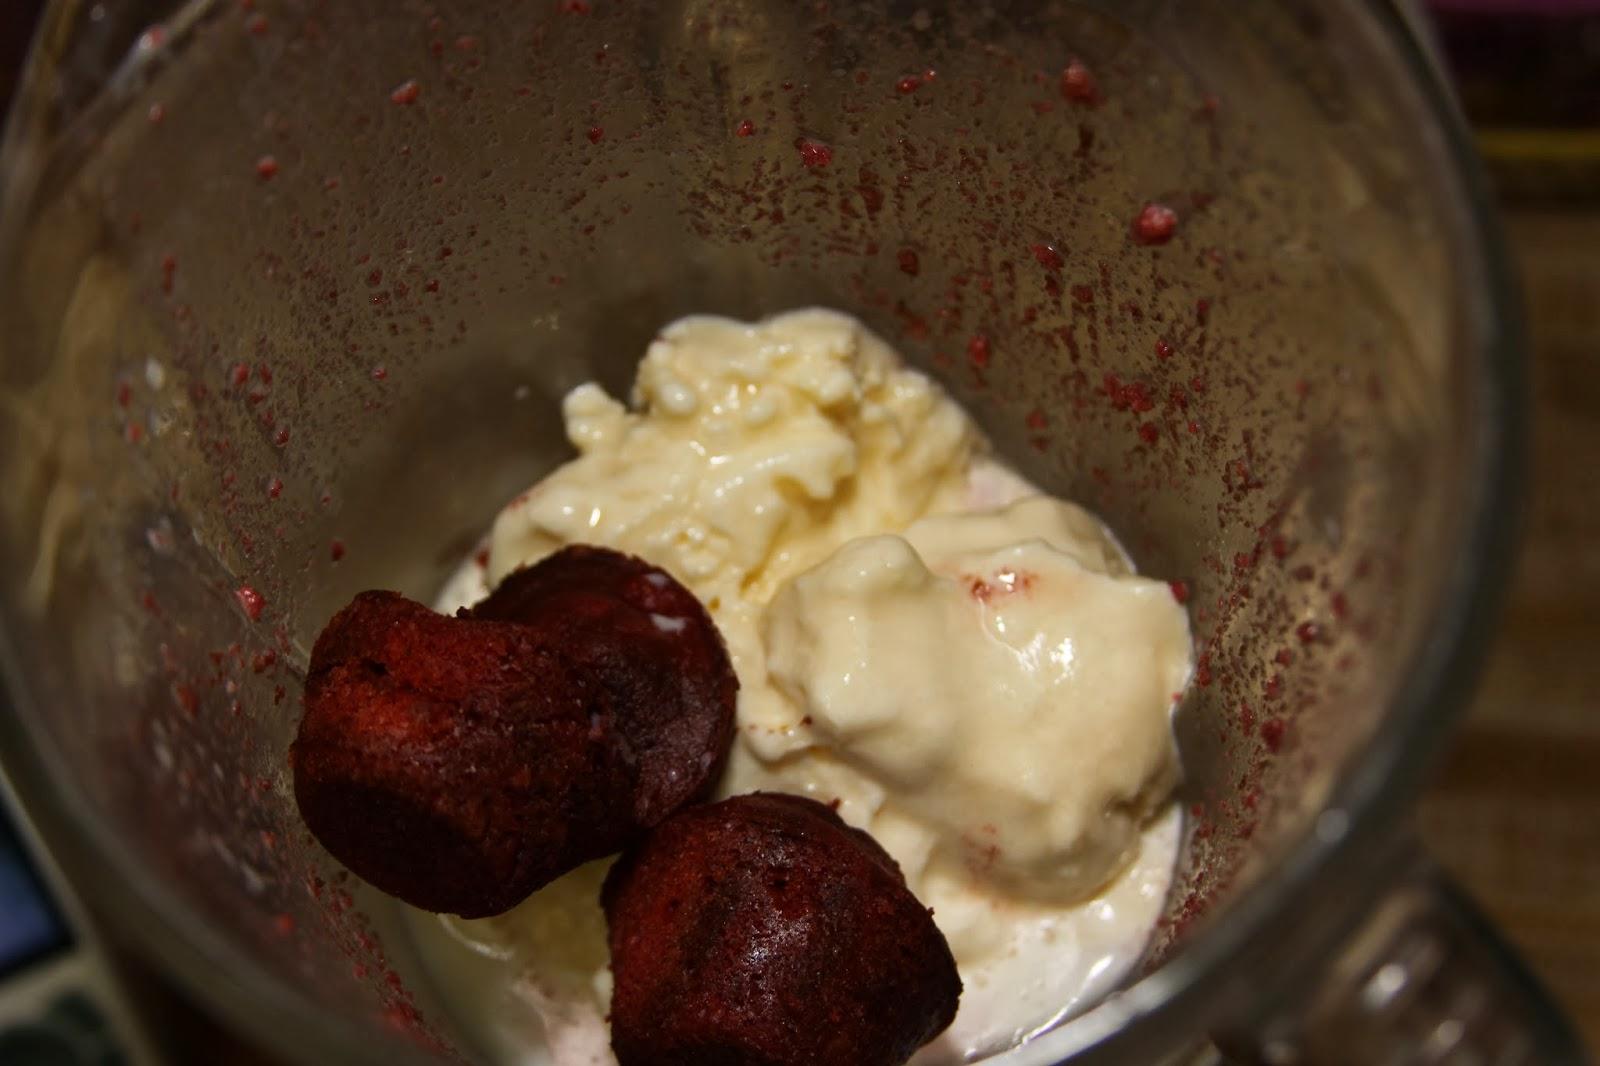 how to make a milkshake with heavy cream